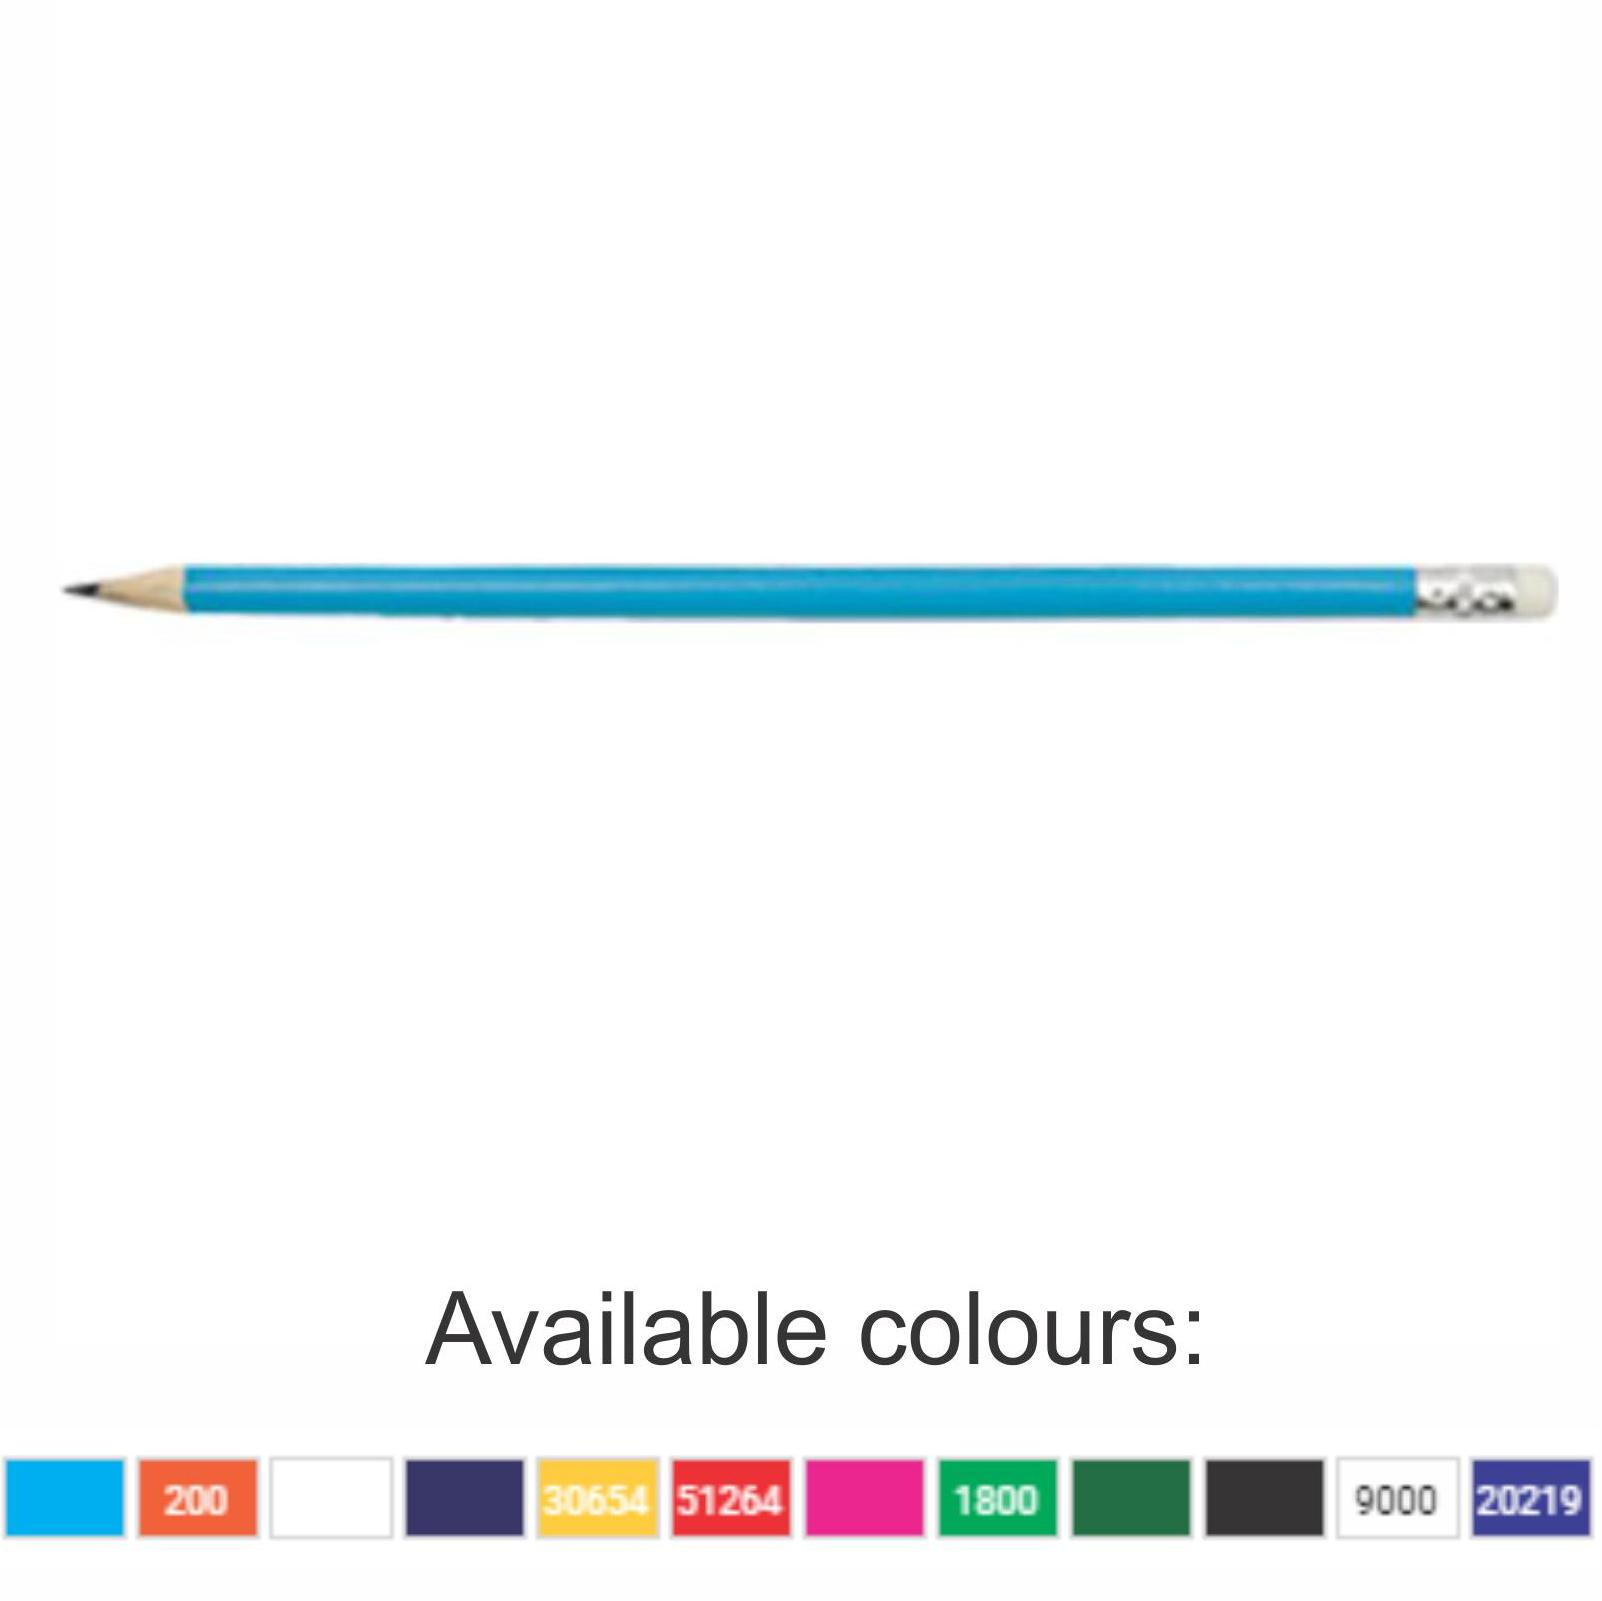 Pencils With 1 Colour Print